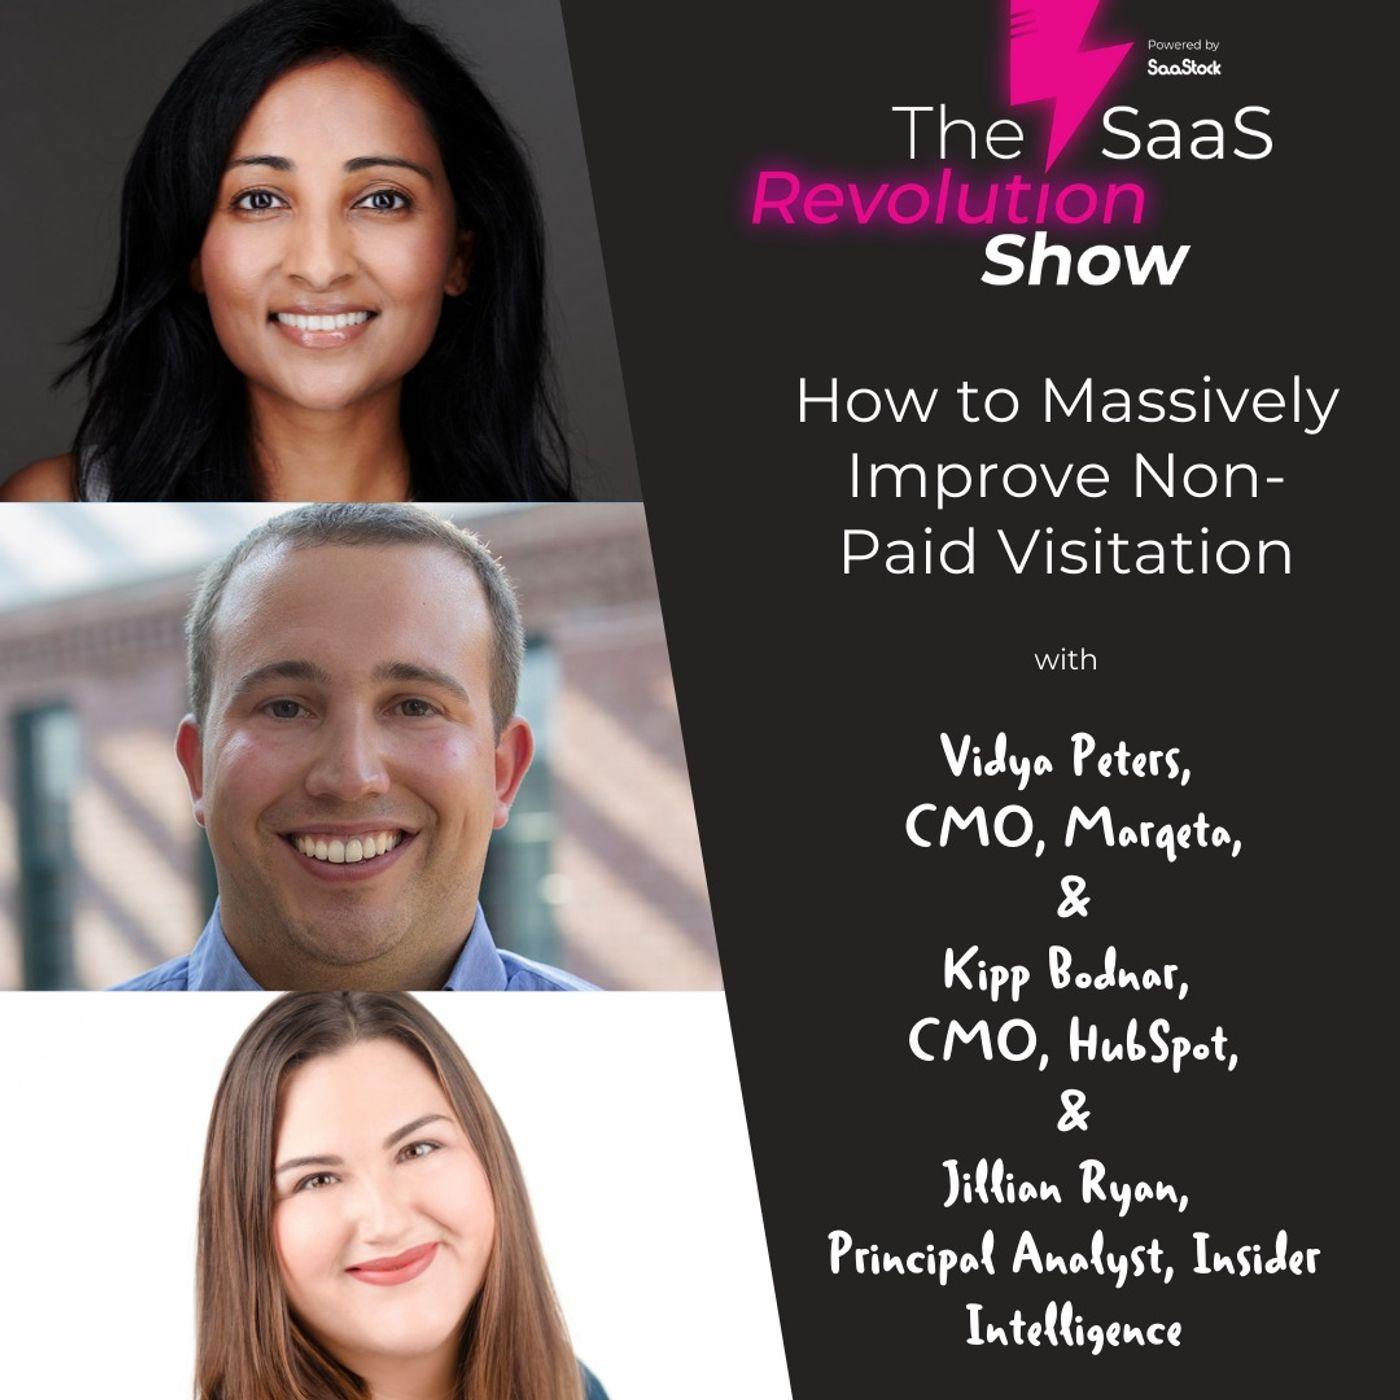 How to Massively Improve Non-Paid Visitation, with Kipp Bodnar (HubSpot), Vidya Peters (Marqeta) & Jillian Ryan